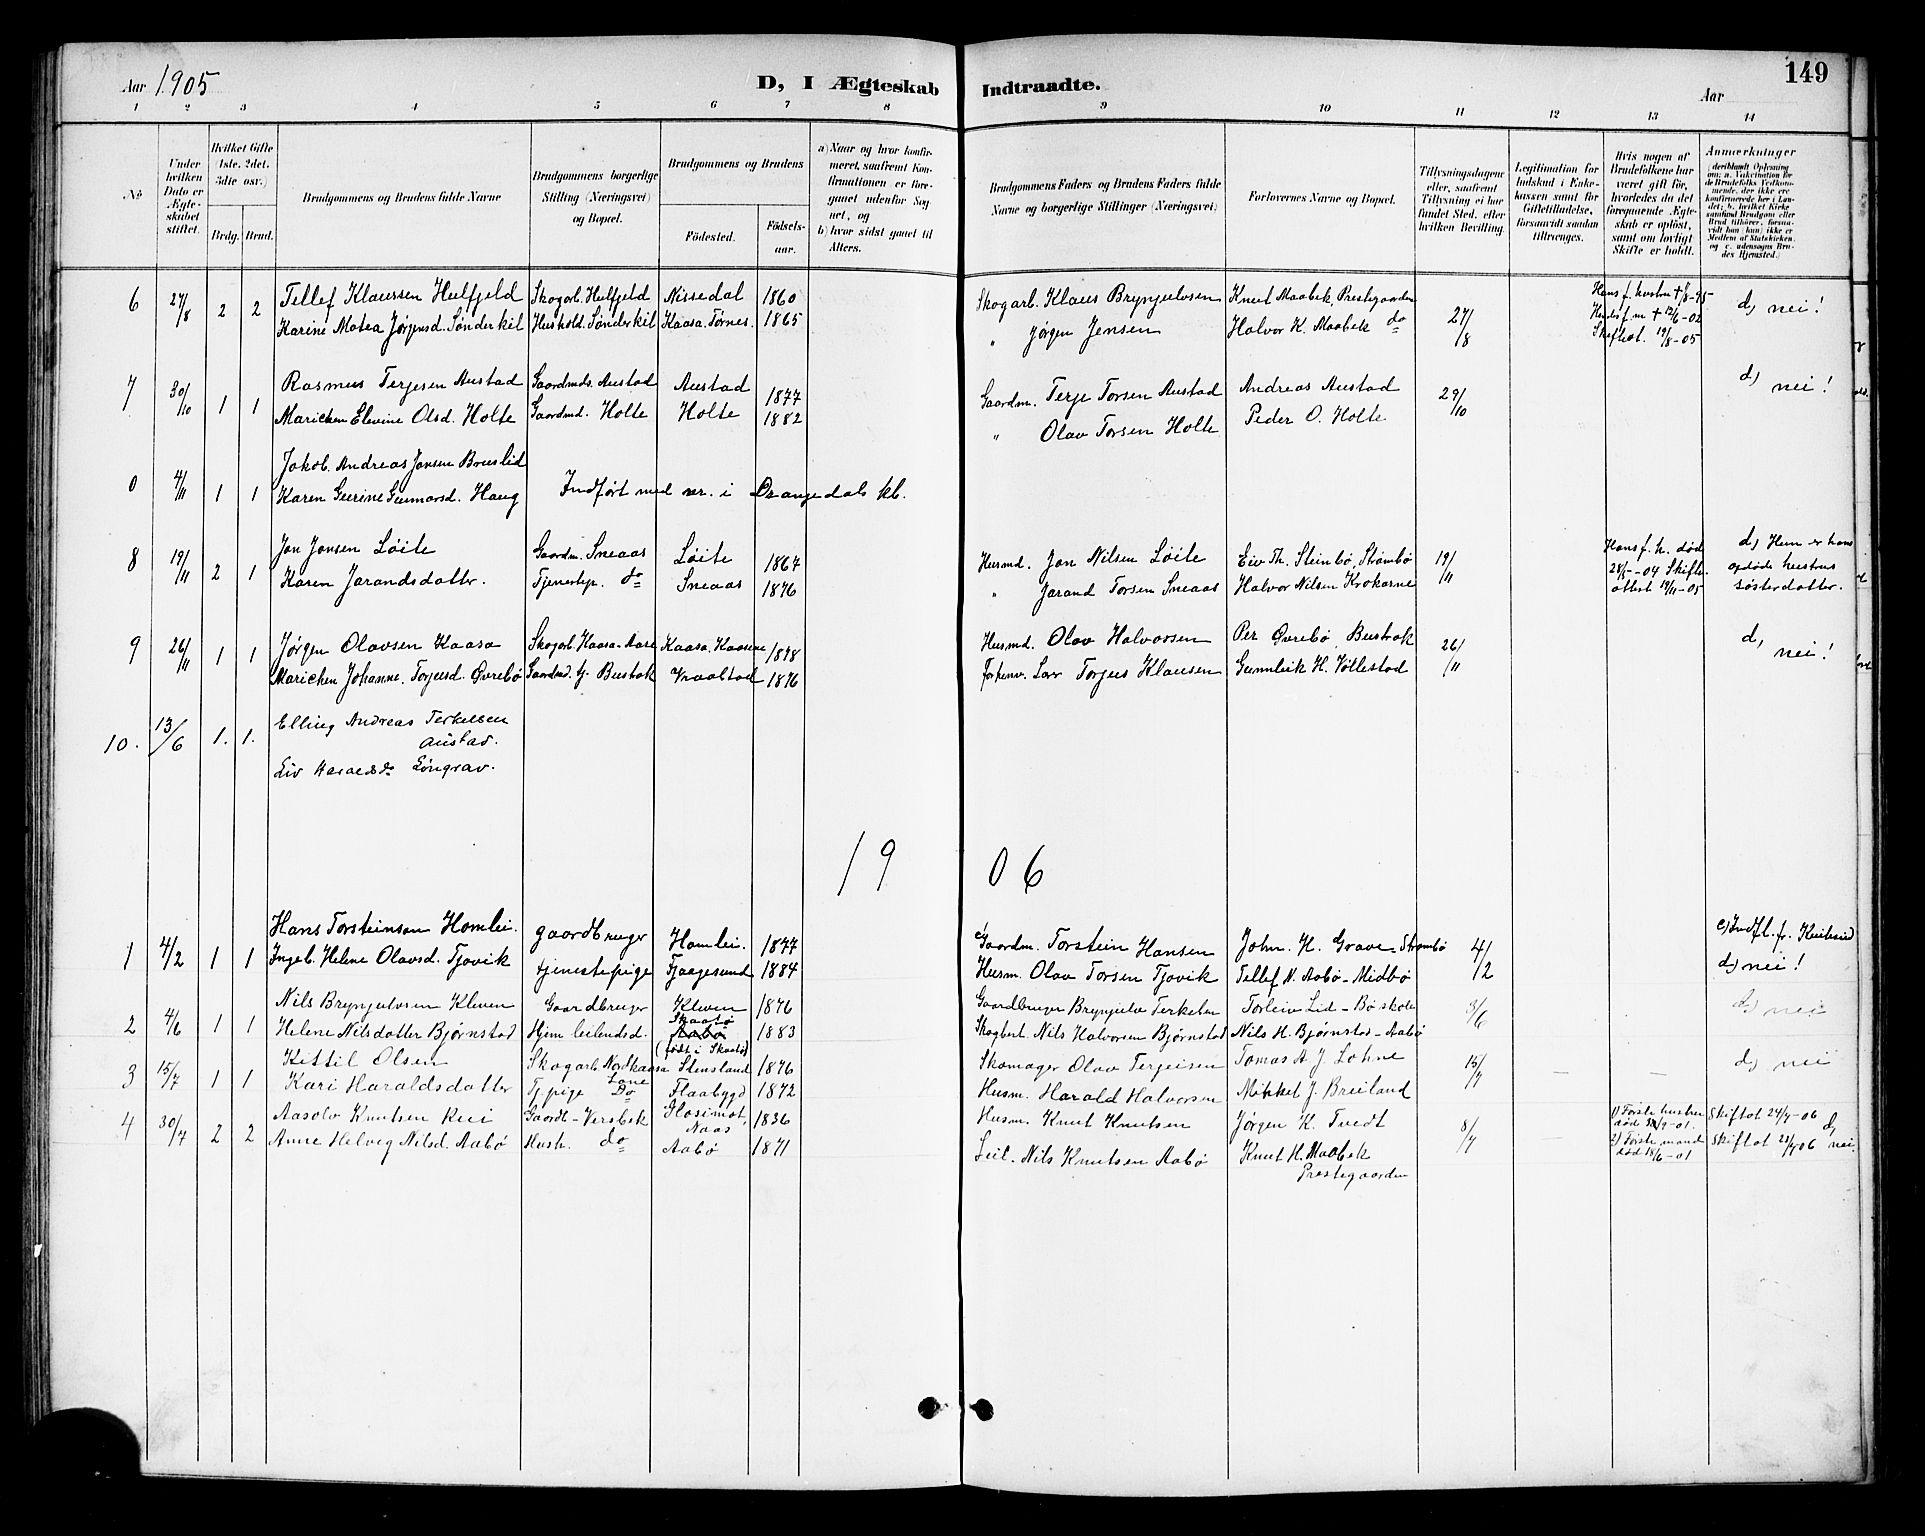 SAKO, Drangedal kirkebøker, G/Gb/L0002: Klokkerbok nr. II 2, 1895-1918, s. 149